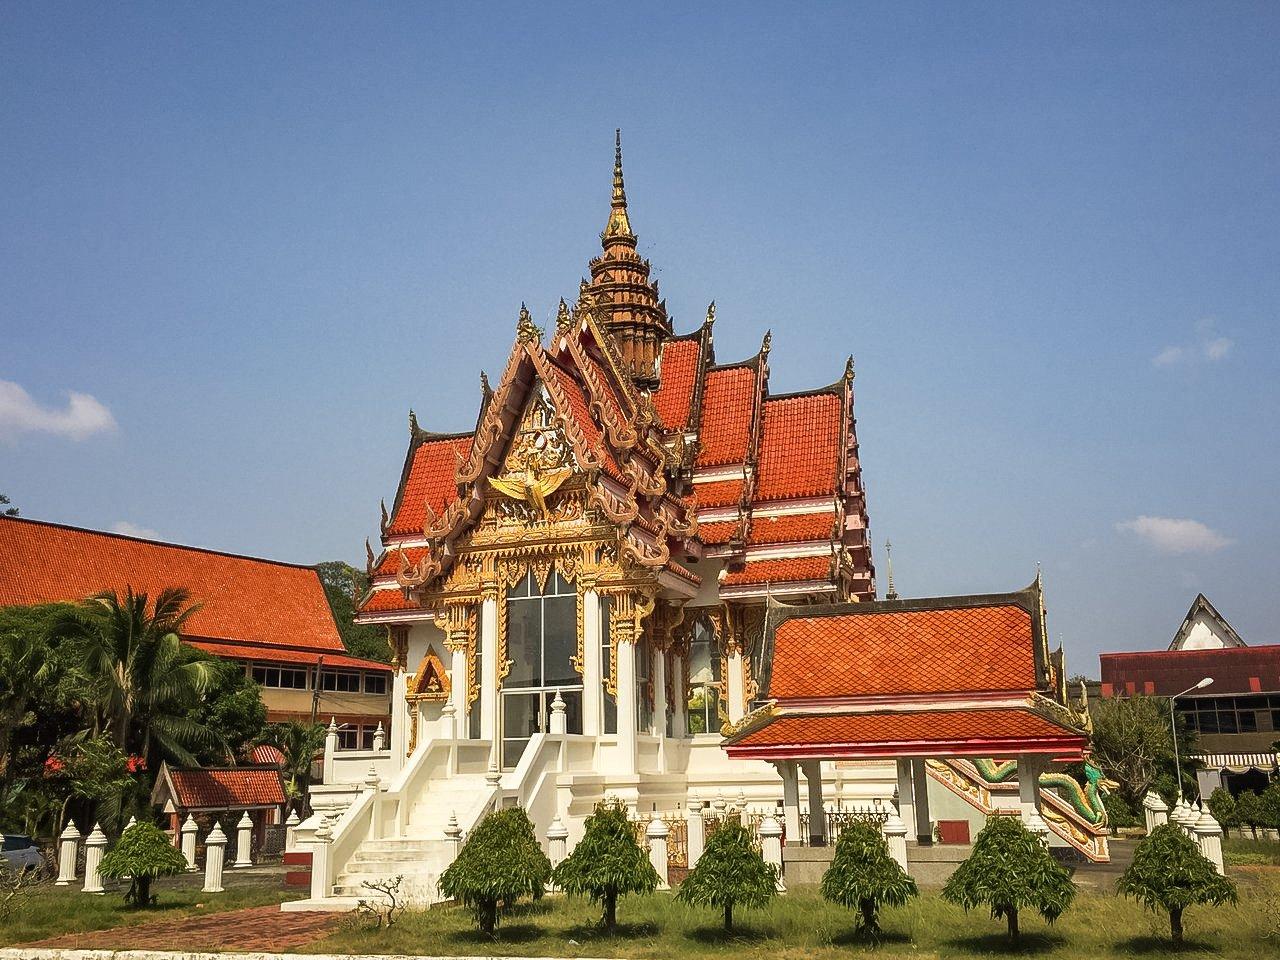 Wat Hatyai Nai is the buddhist temple in Hatyai with third largest reclining Buddha.